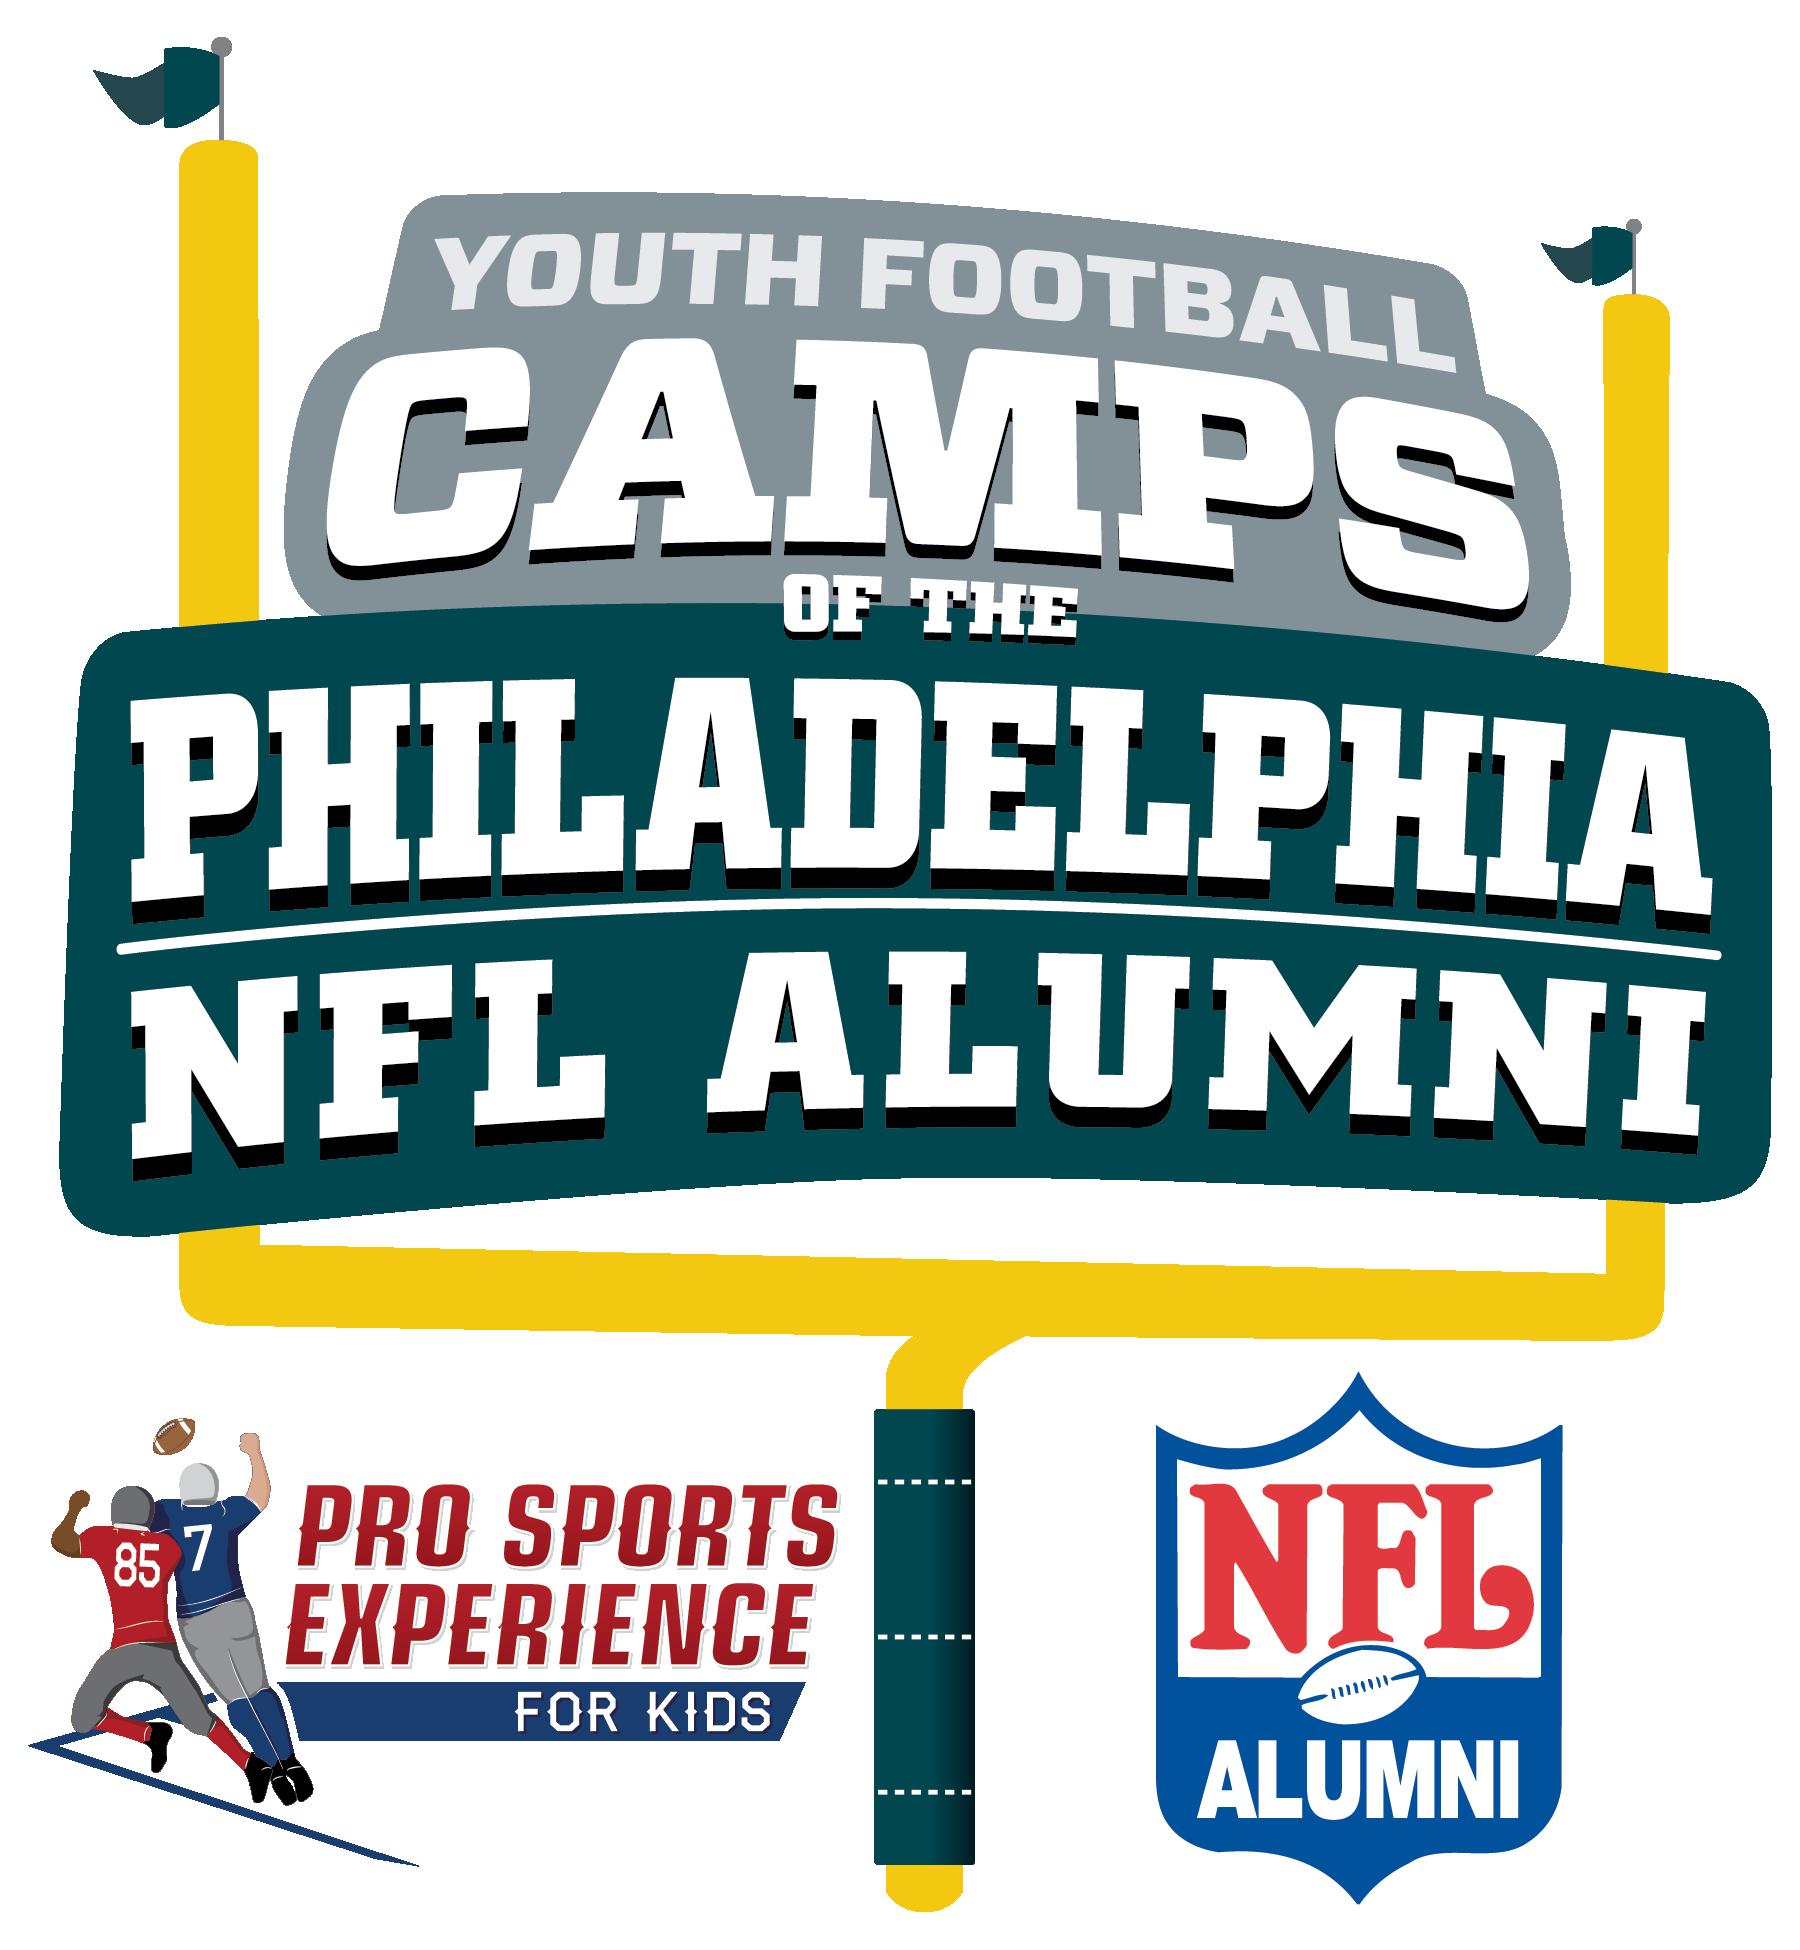 Philadelphia NFL Alumni Hero Youth Football Camps - Lancaster